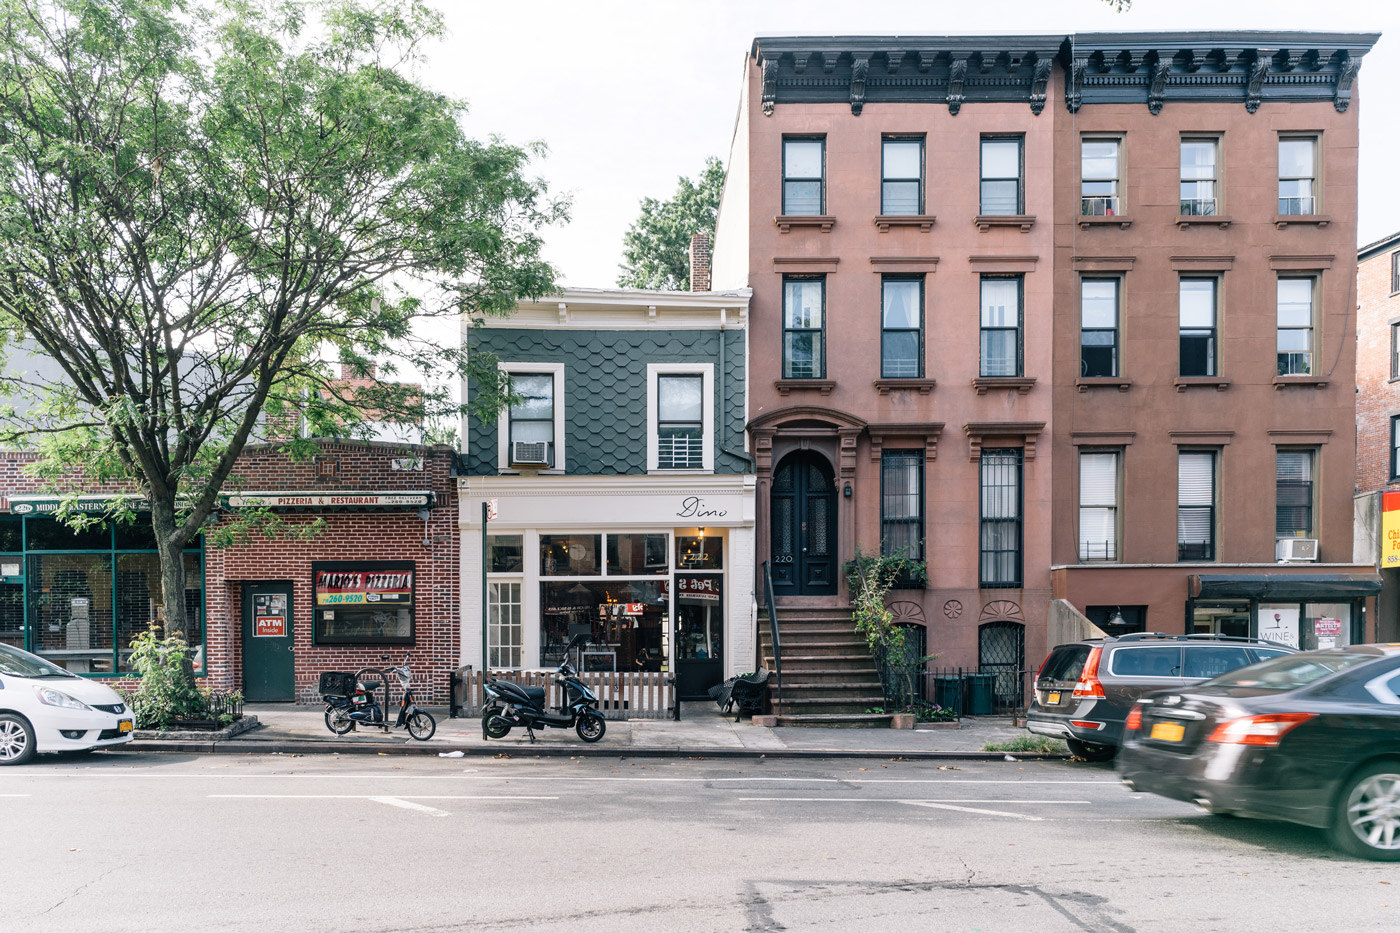 Dino in Fort Greene. 222 Dekalb Ave, Brooklyn, NY 11205